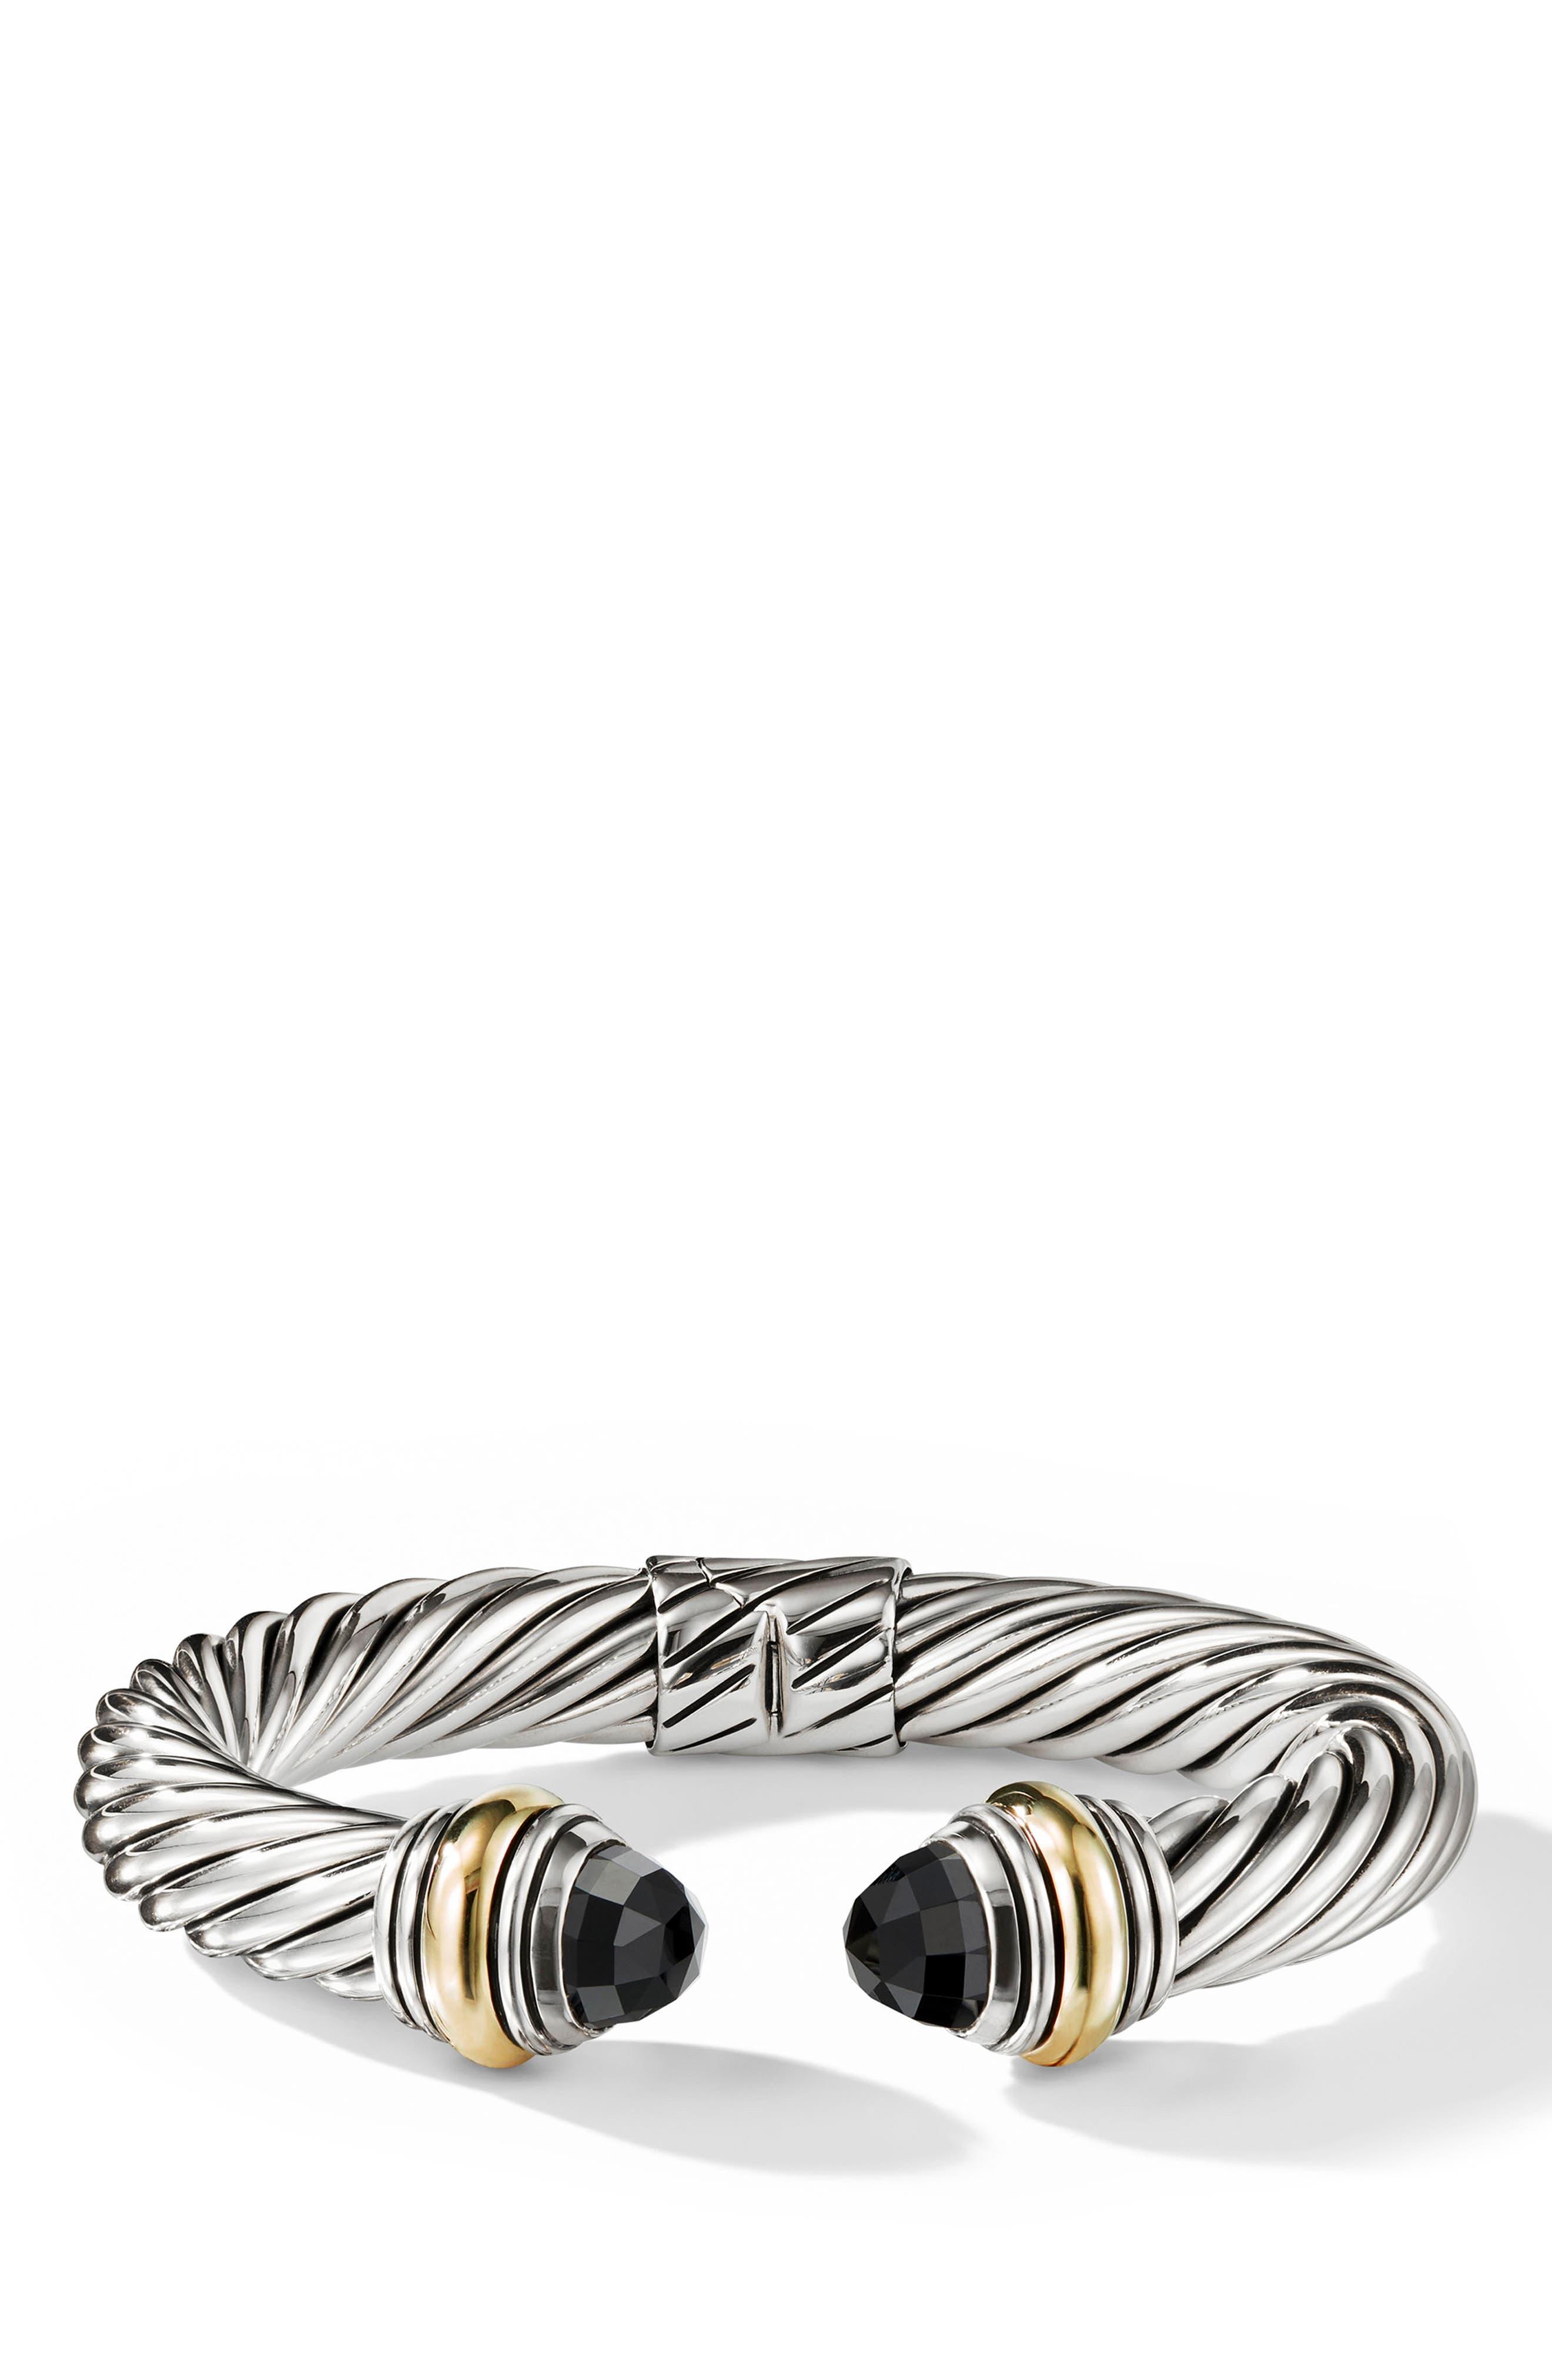 DAVID YURMAN, Cable Classics Bracelet, Main thumbnail 1, color, GOLD/ SILVER/ BLACK ONYX